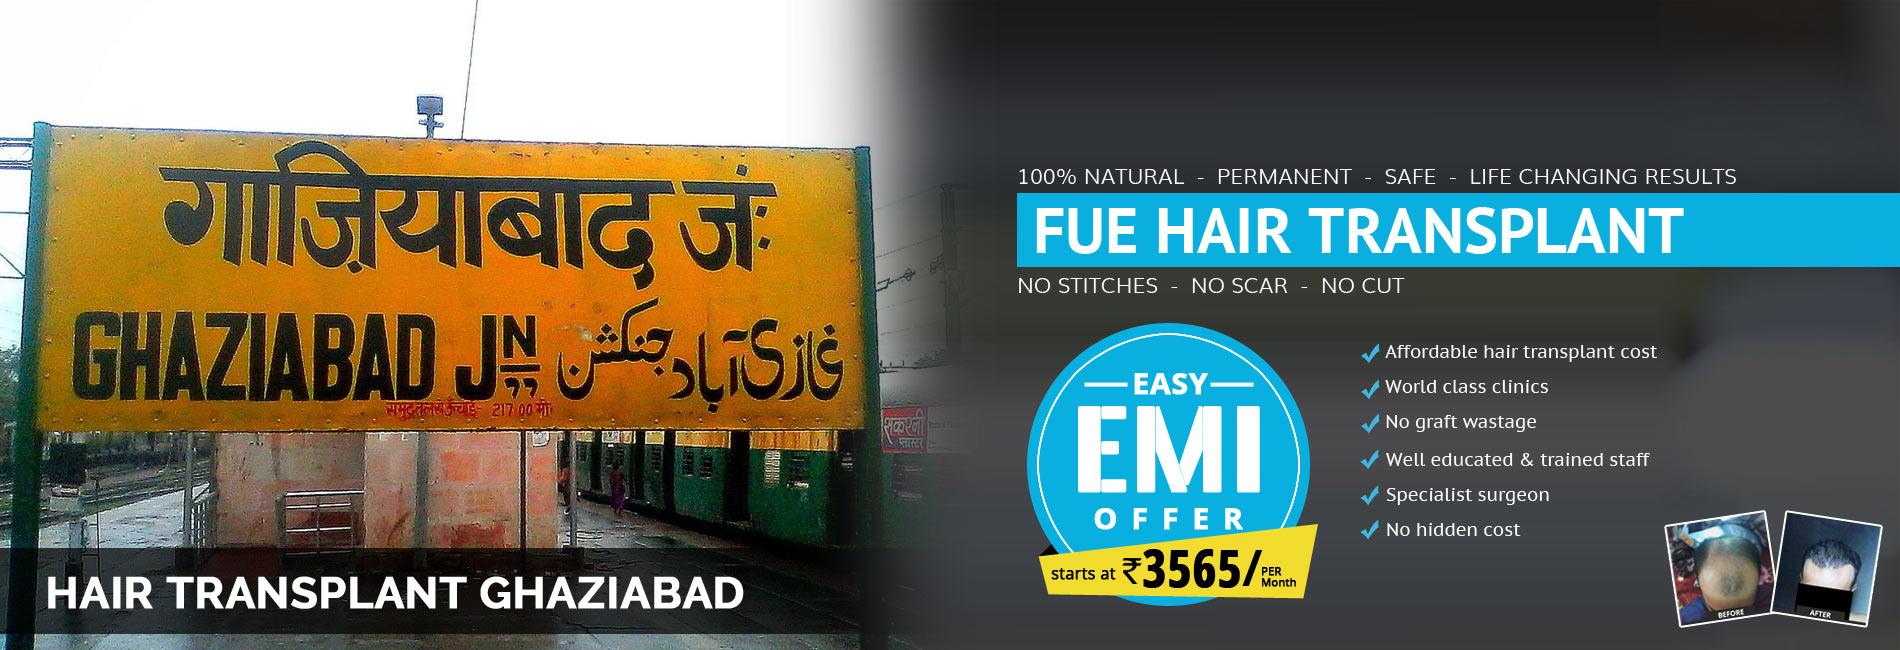 Hair Transplant Ghaziabad